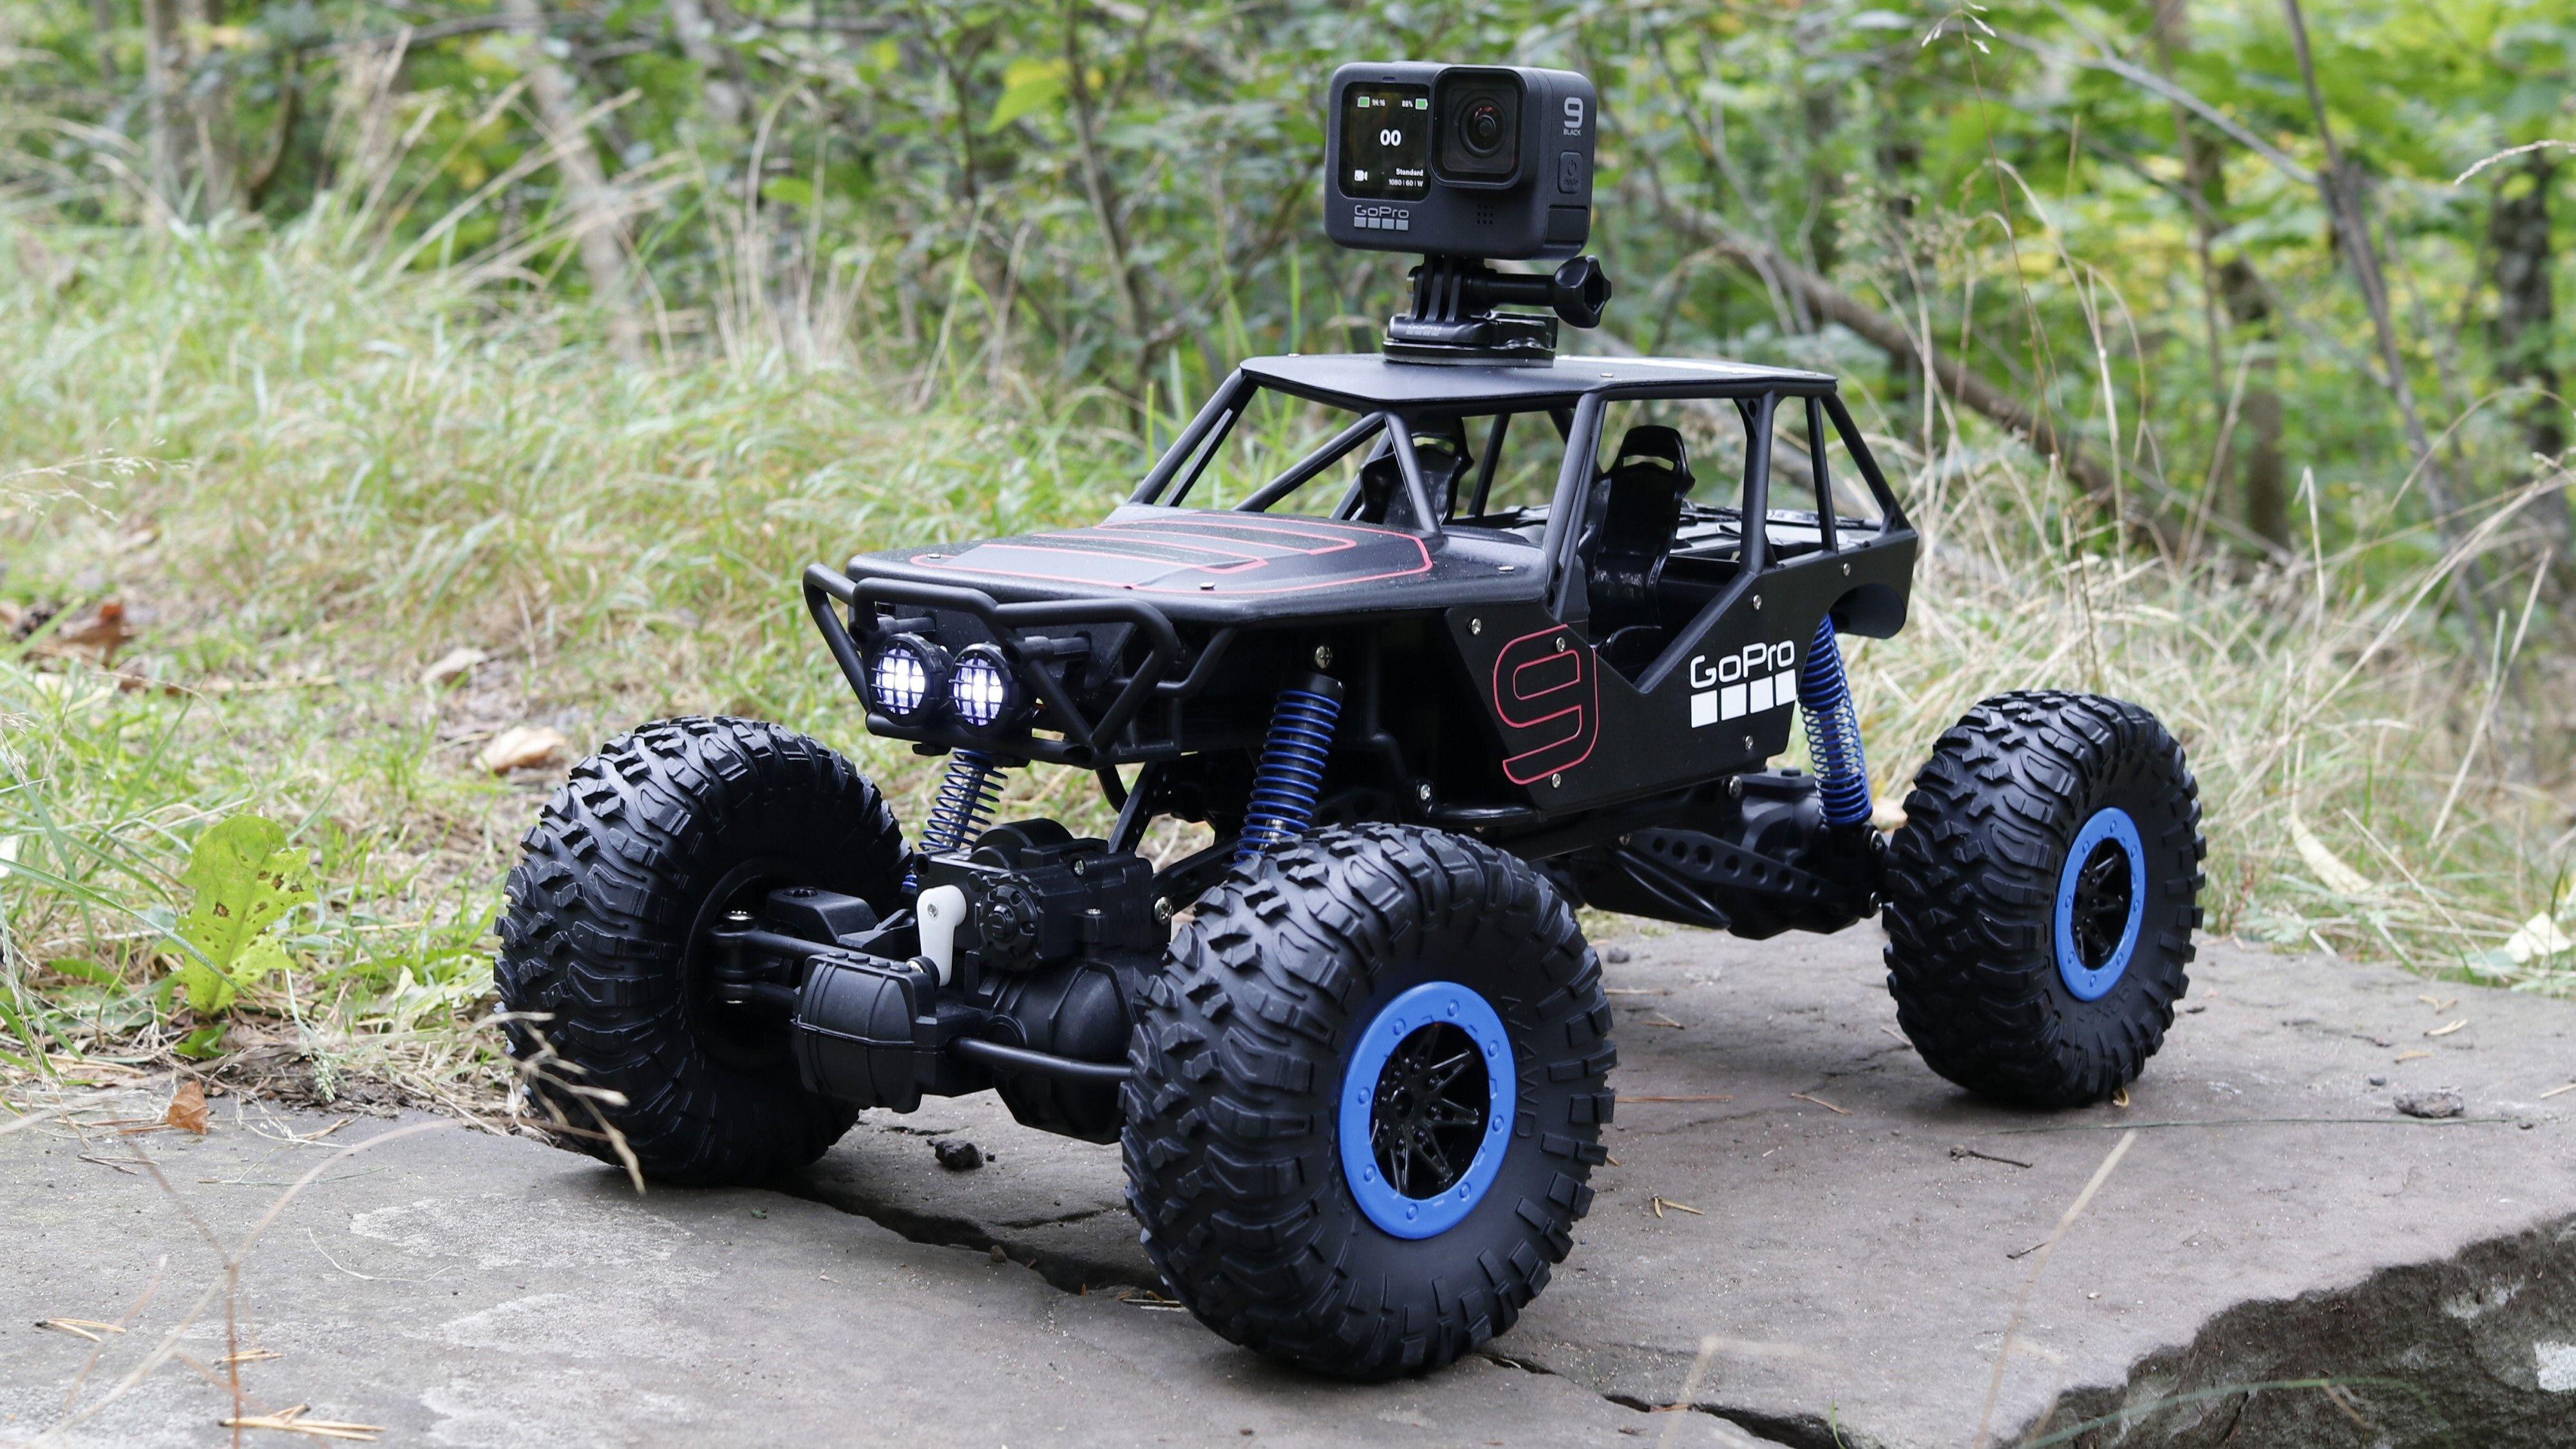 GoPro stilte med både kamera og en hendig testbil.